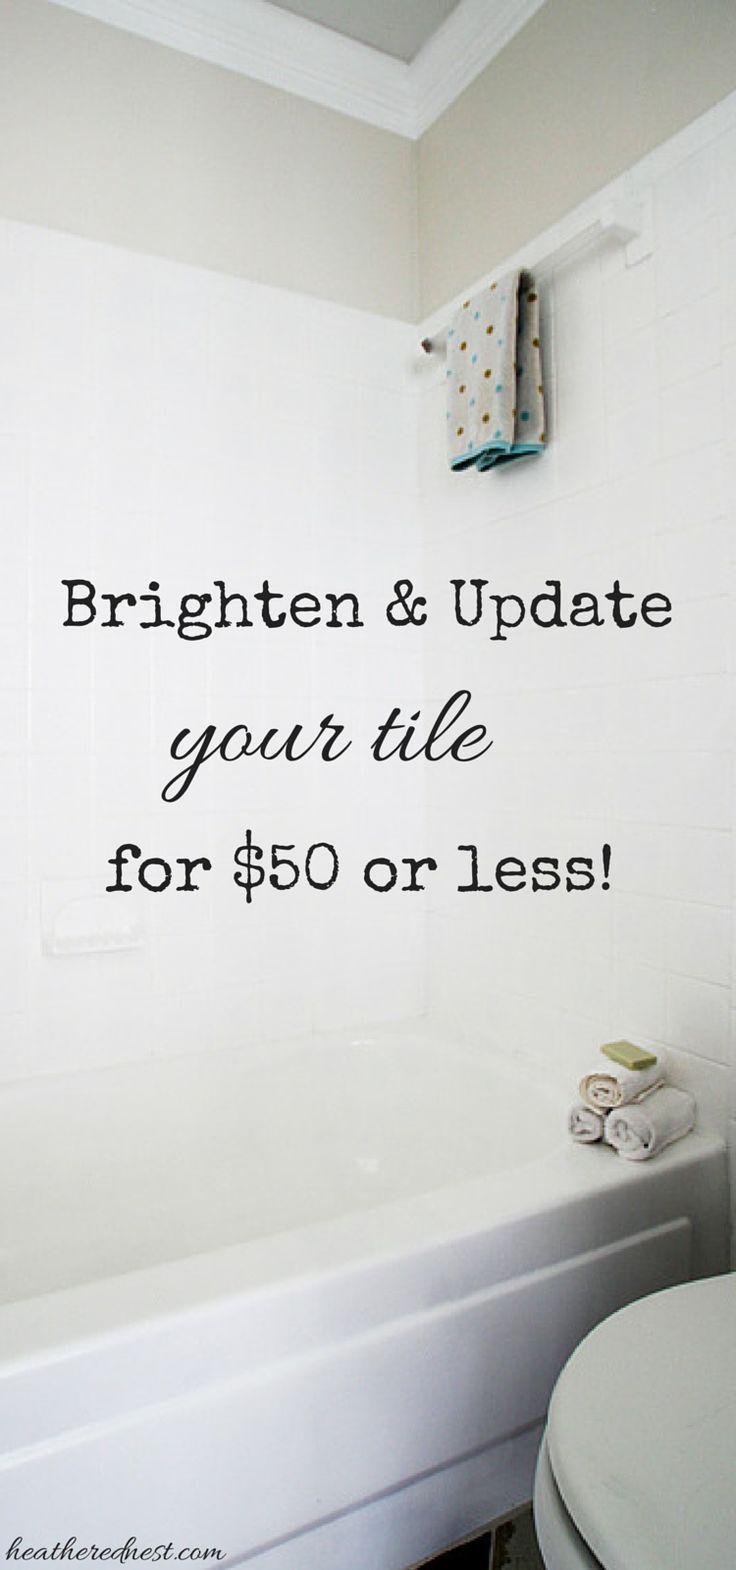 17 best ideas about painting bathroom tiles on pinterest   paint